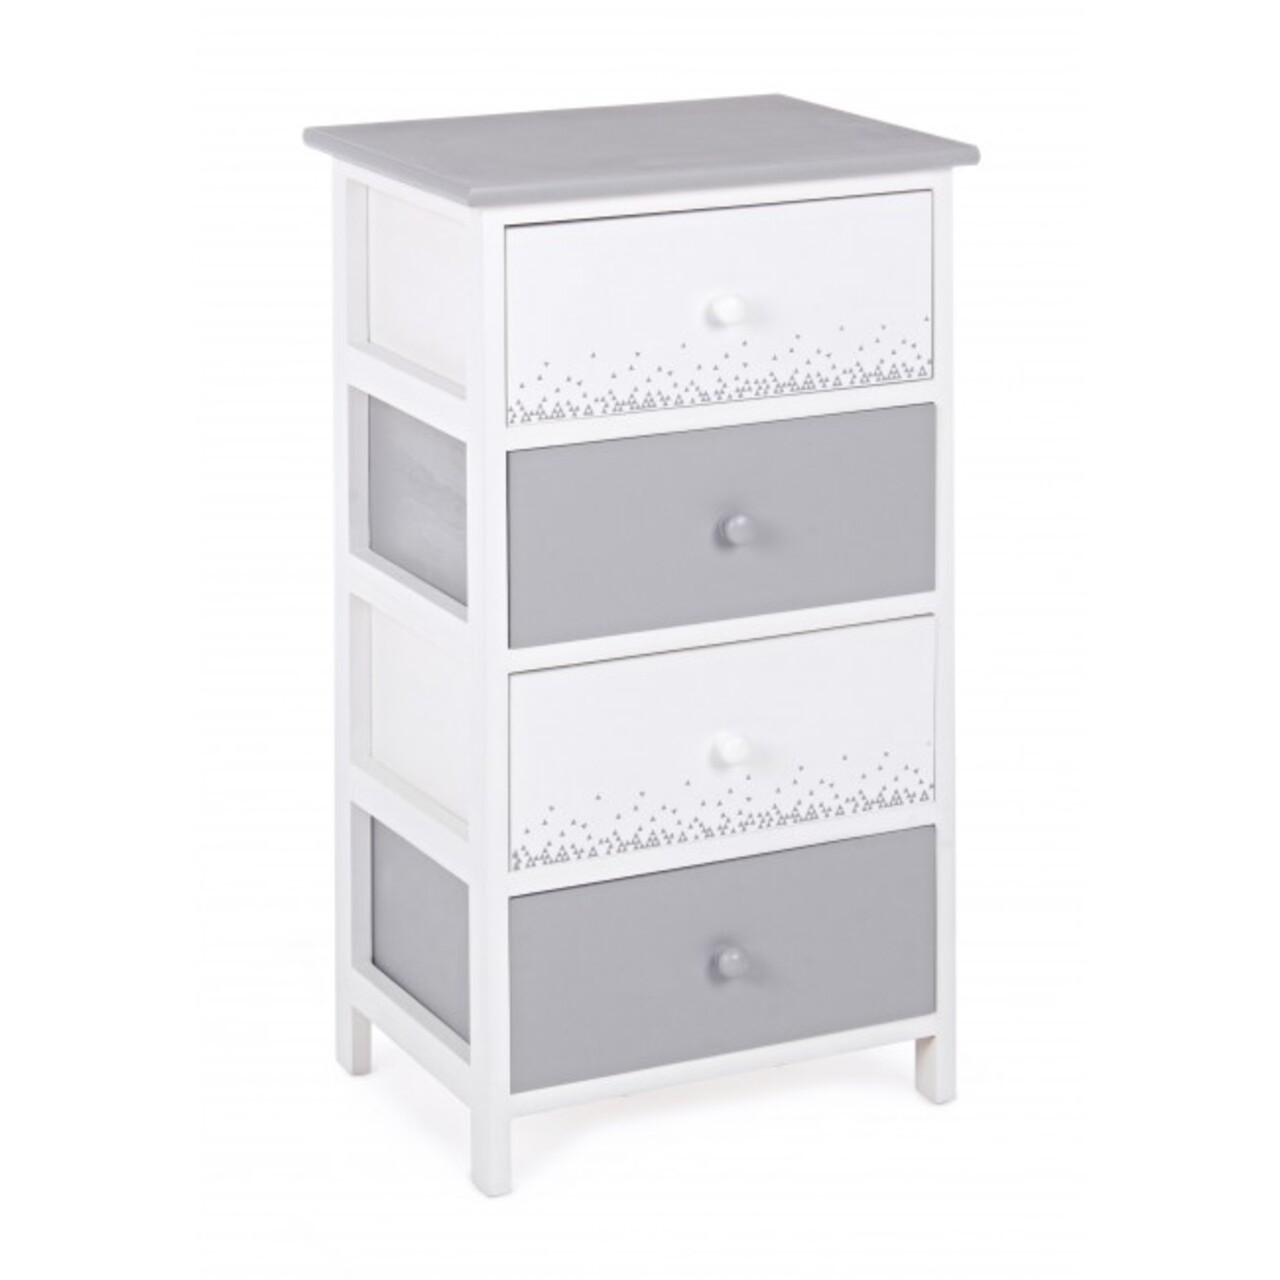 Comoda cu 4 sertare, Ally White Grey, Bizzotto, 40x29x73 cm, lemn de paulownia